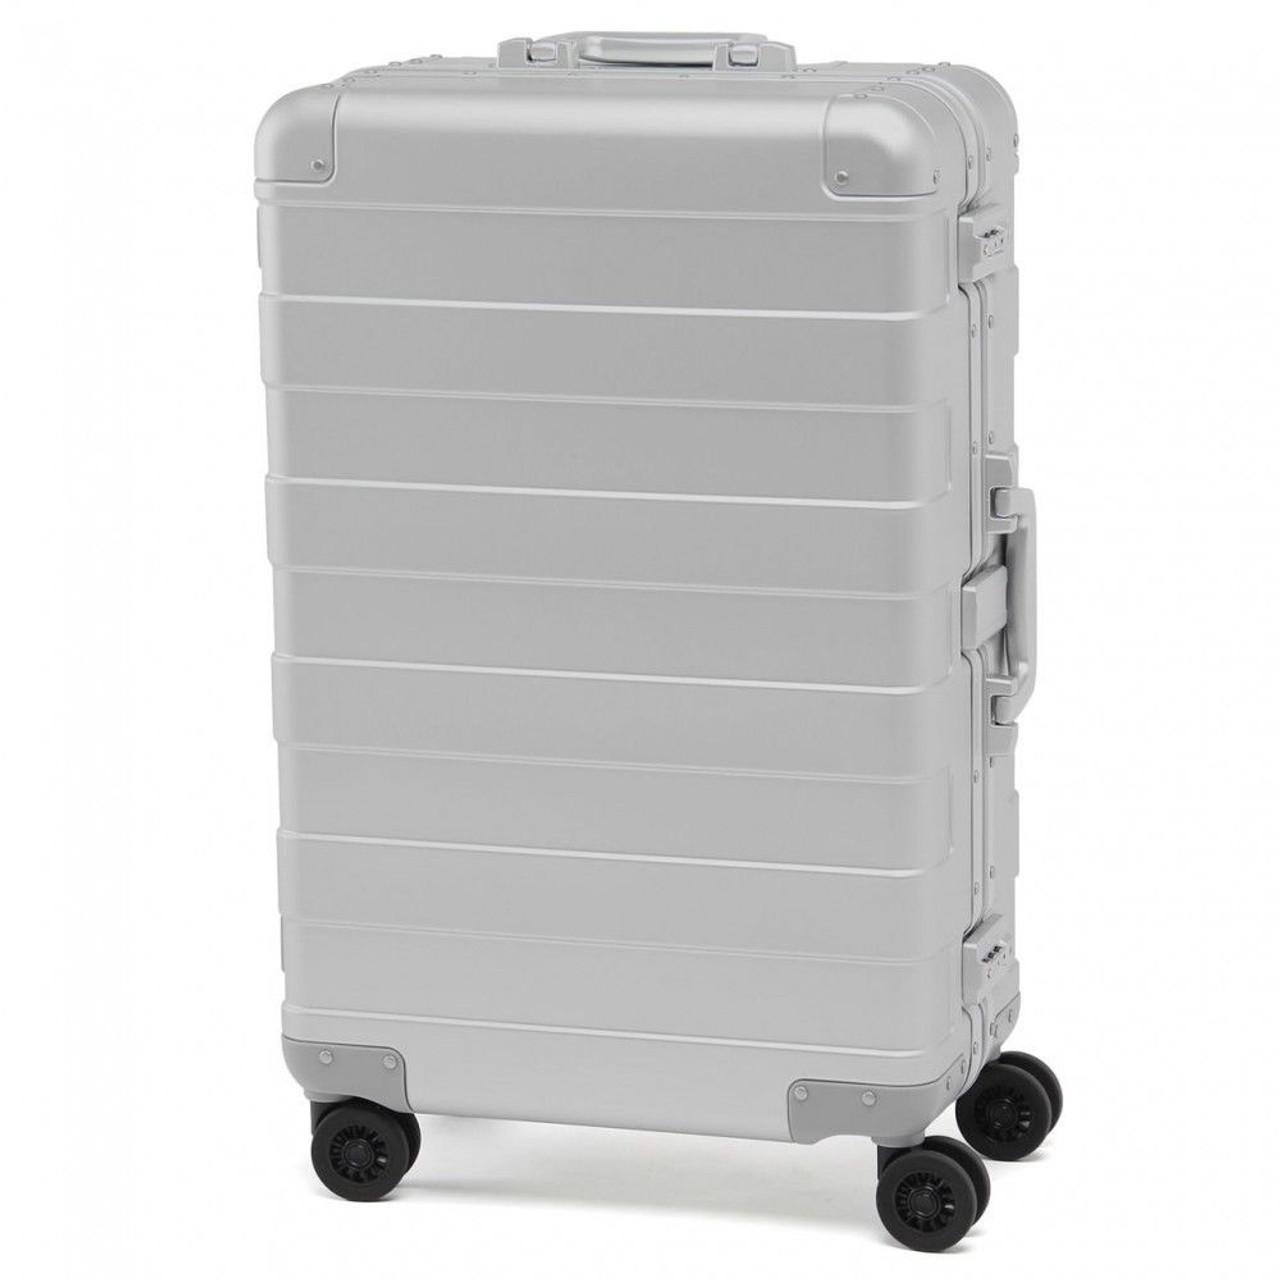 Sale Price Muji Aluminum Suitcase 60l Tsa Lock Carry Bag Roller Wheelie Luggage Trolley 38689270